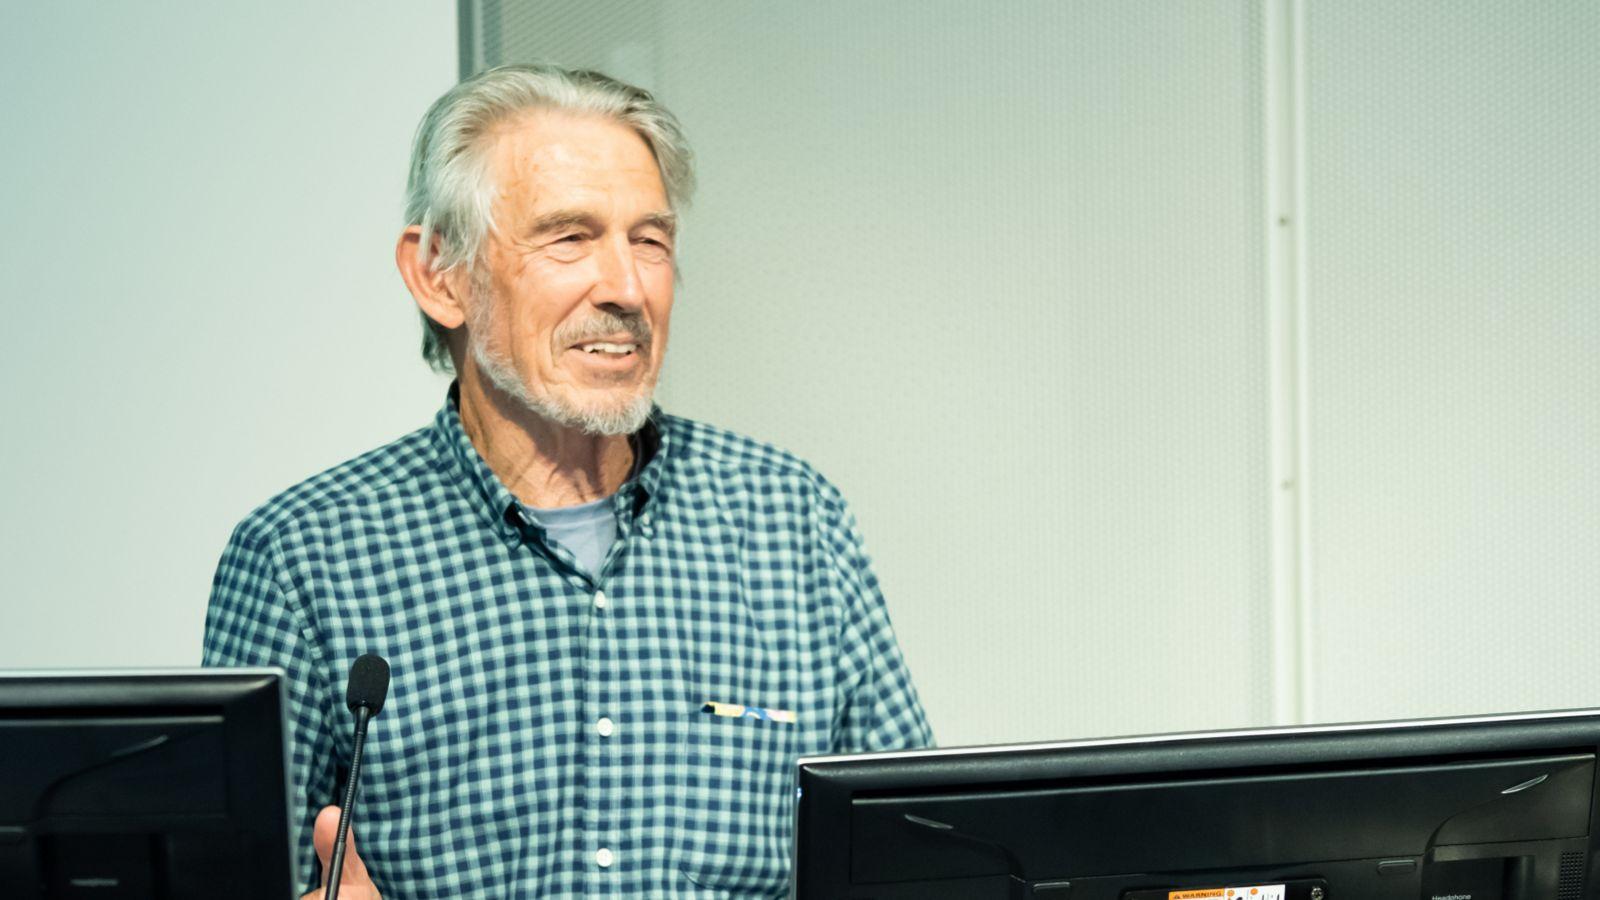 Peter Barrett speaking at the Peter Barrett Symposium in Nov 2020